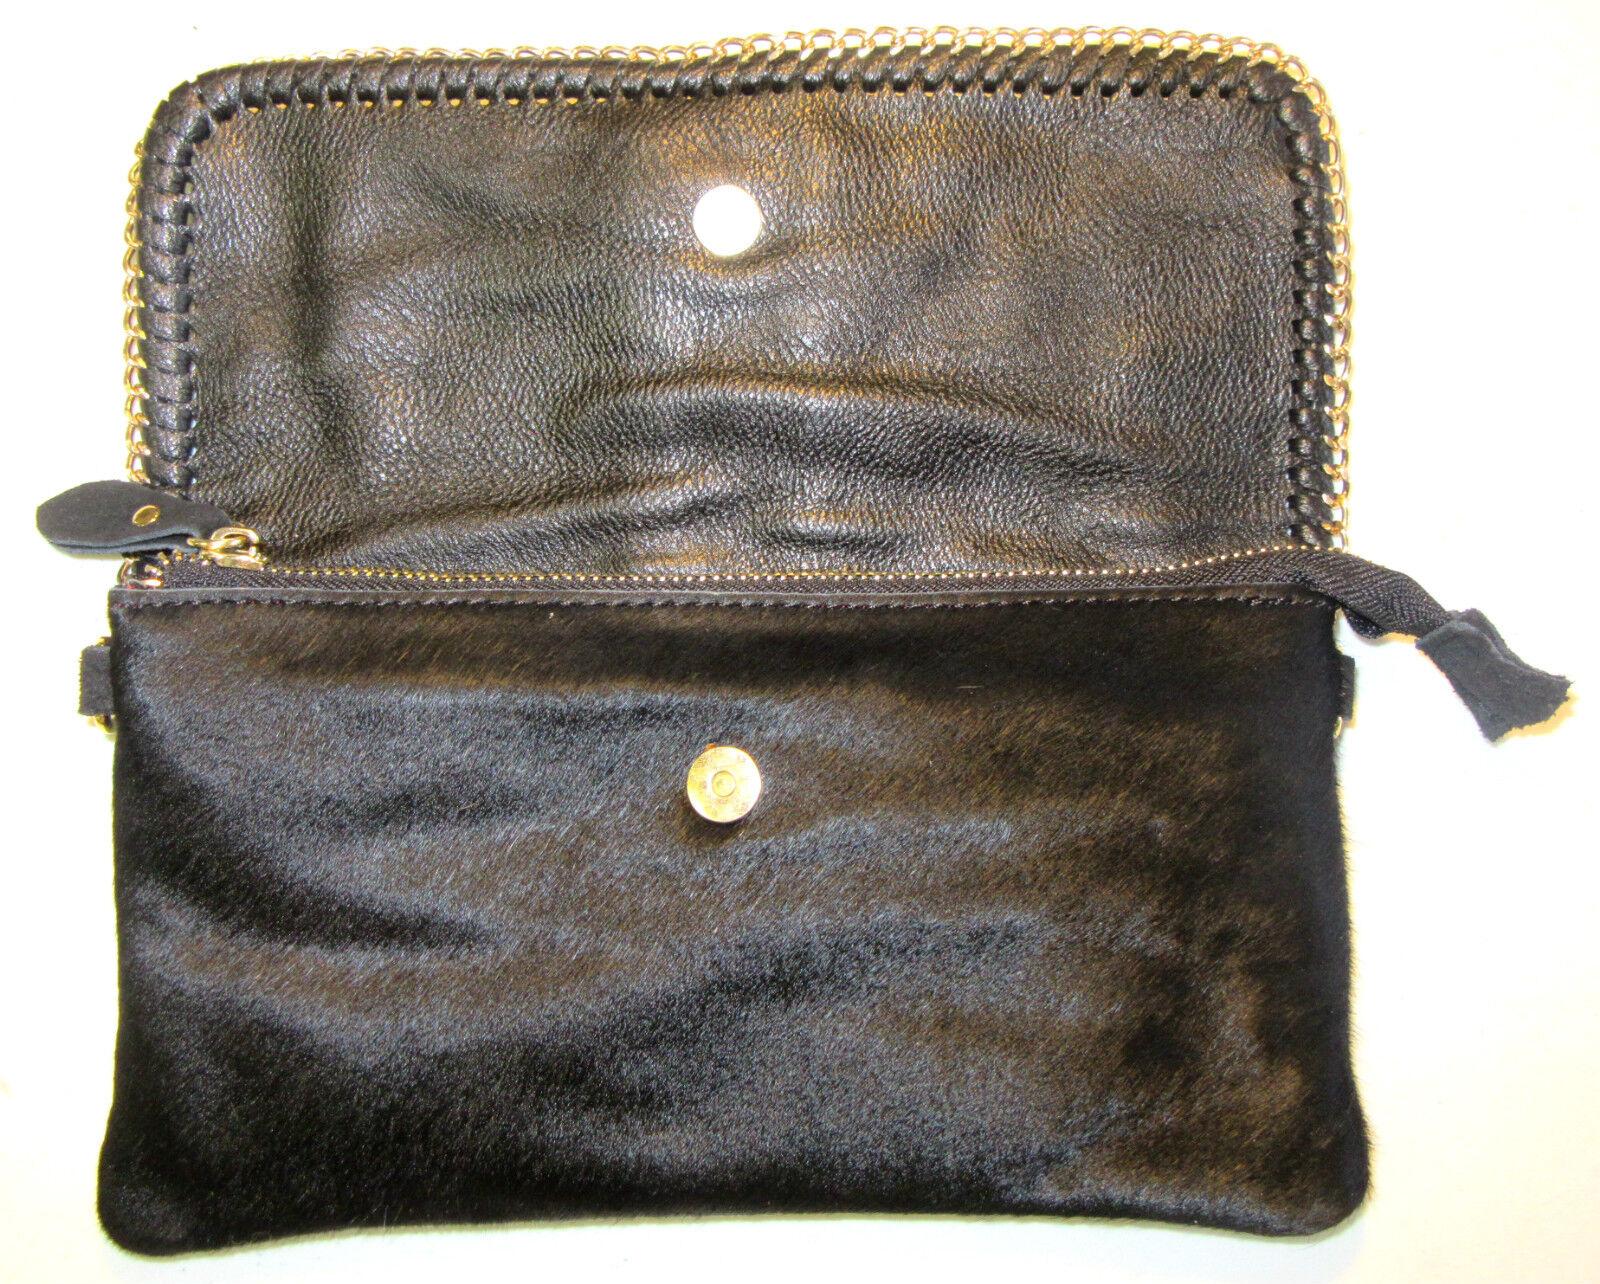 8a6208b3ca89 Sondra Roberts Black Leather Calf-hair Clutch Wristlet Bag W/ Gold Chain  for sale online | eBay